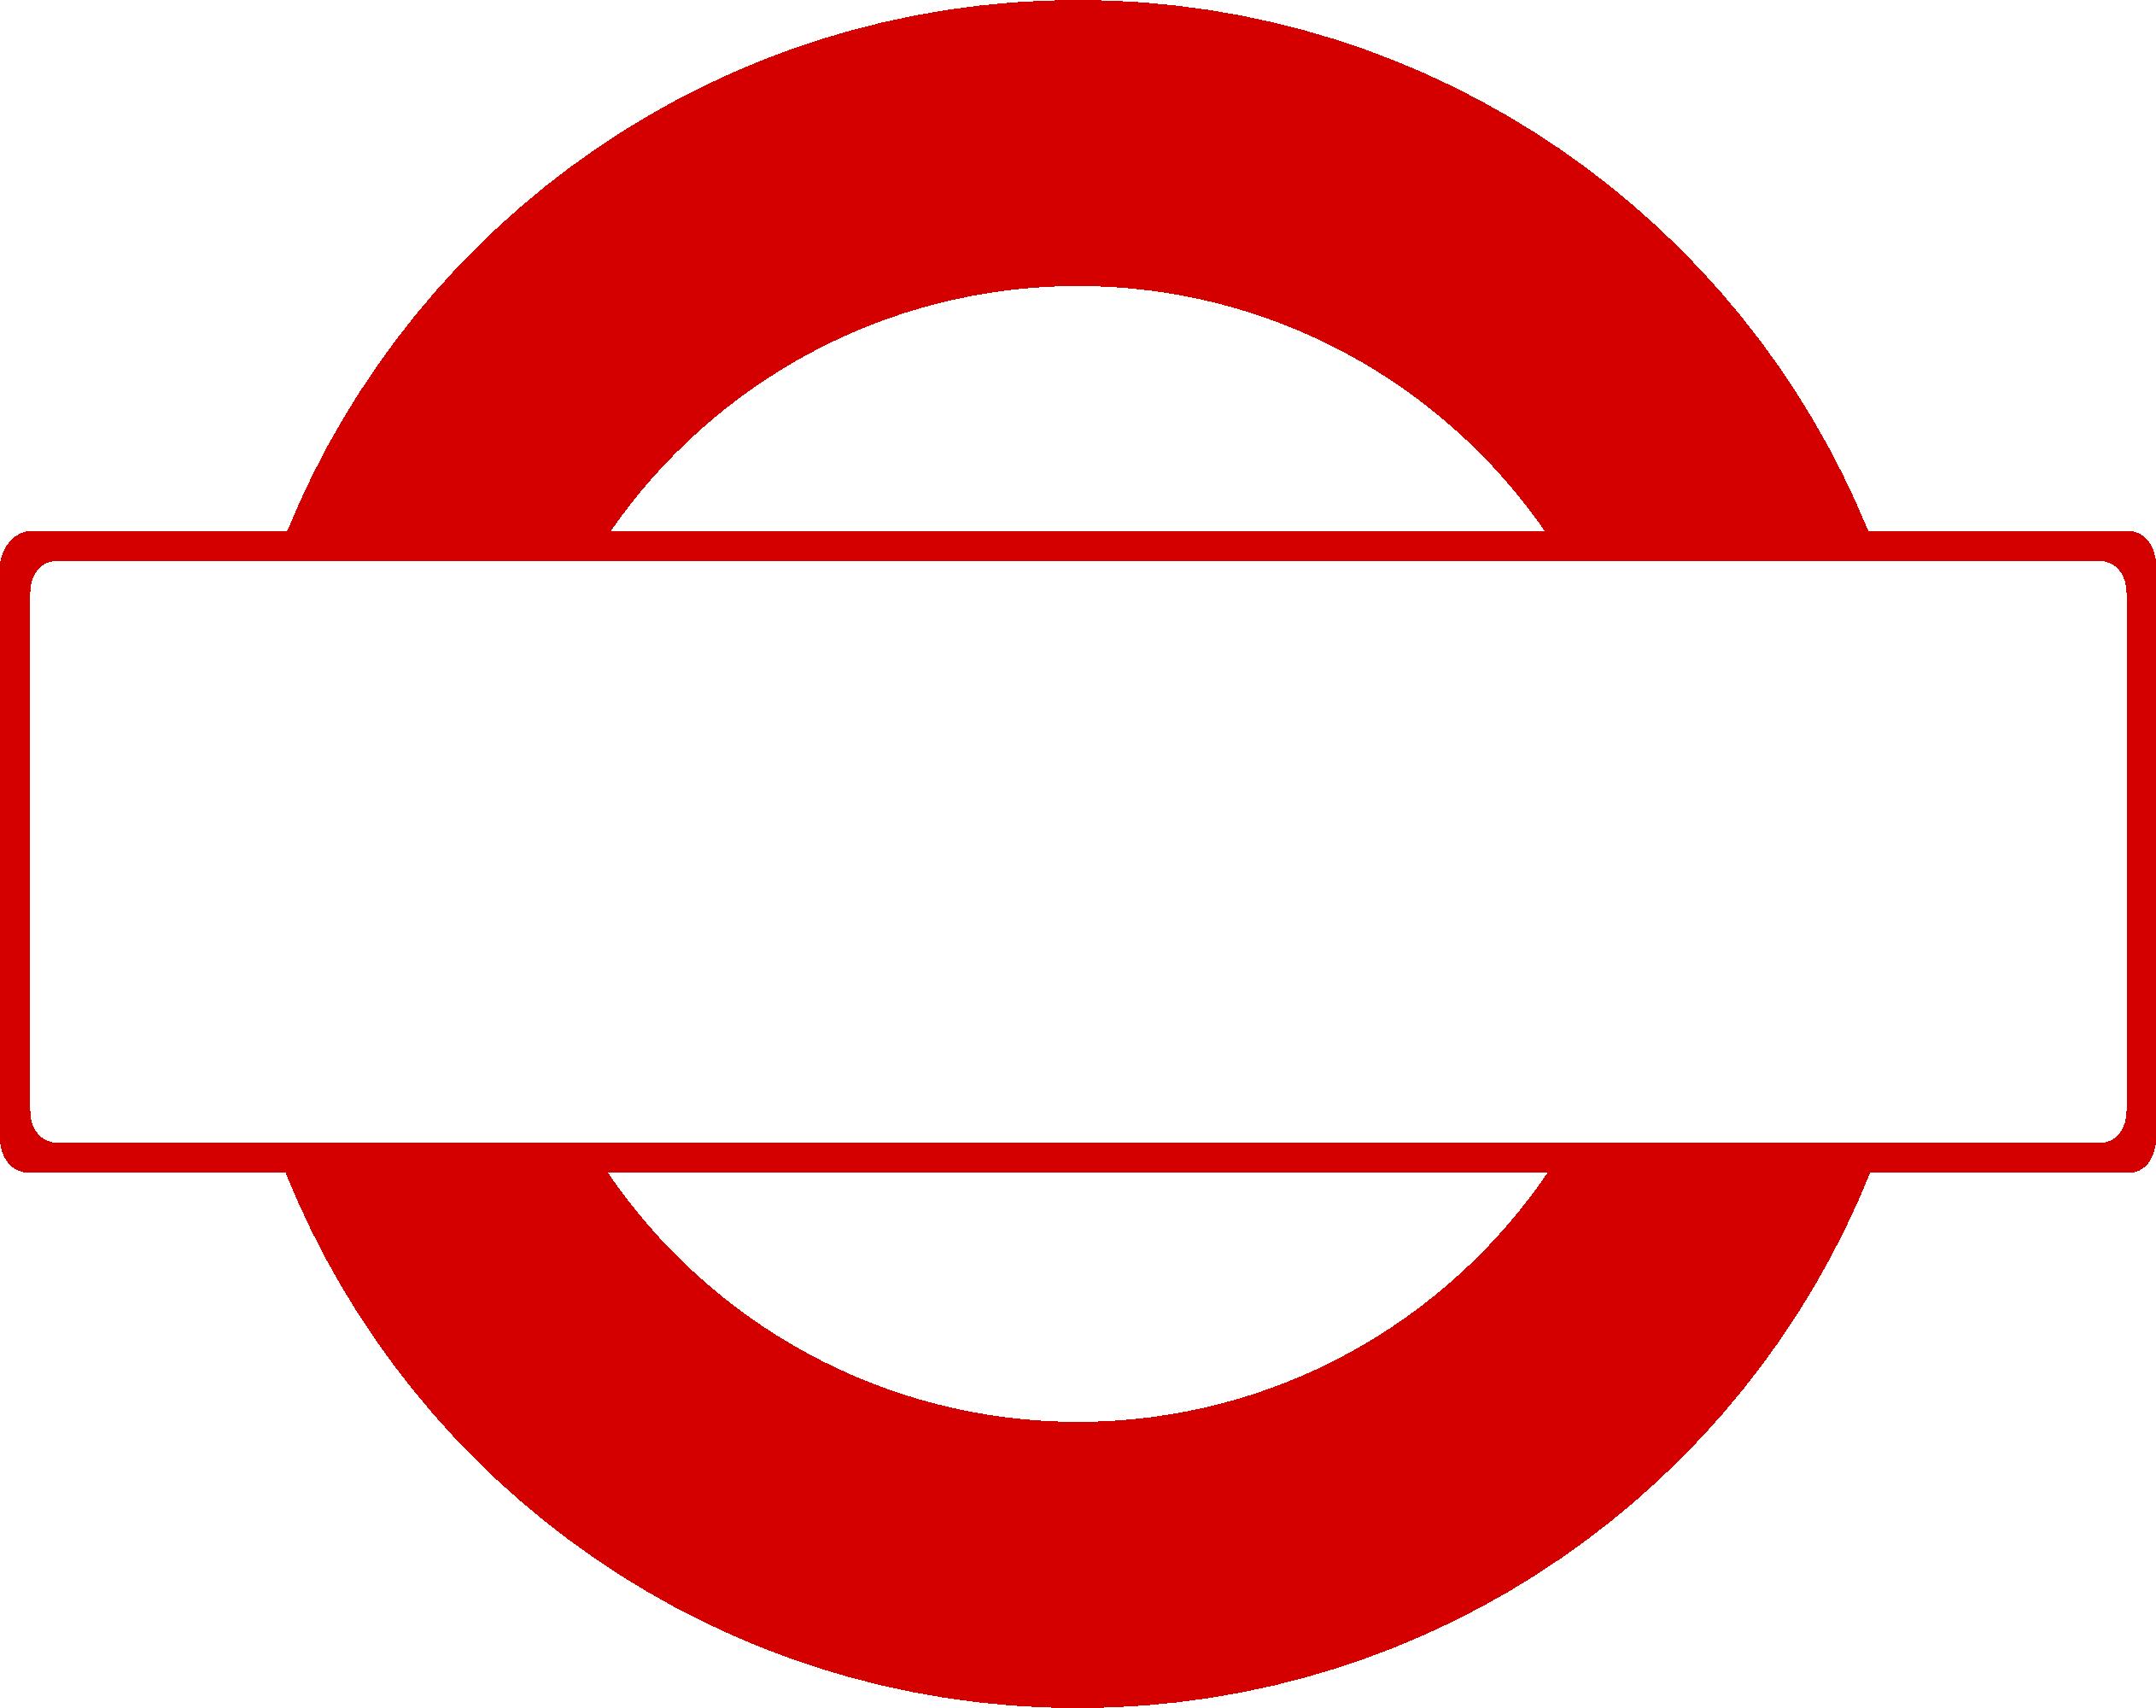 20 Red Empty Stamp Vector (PNG Transparent, SVG).